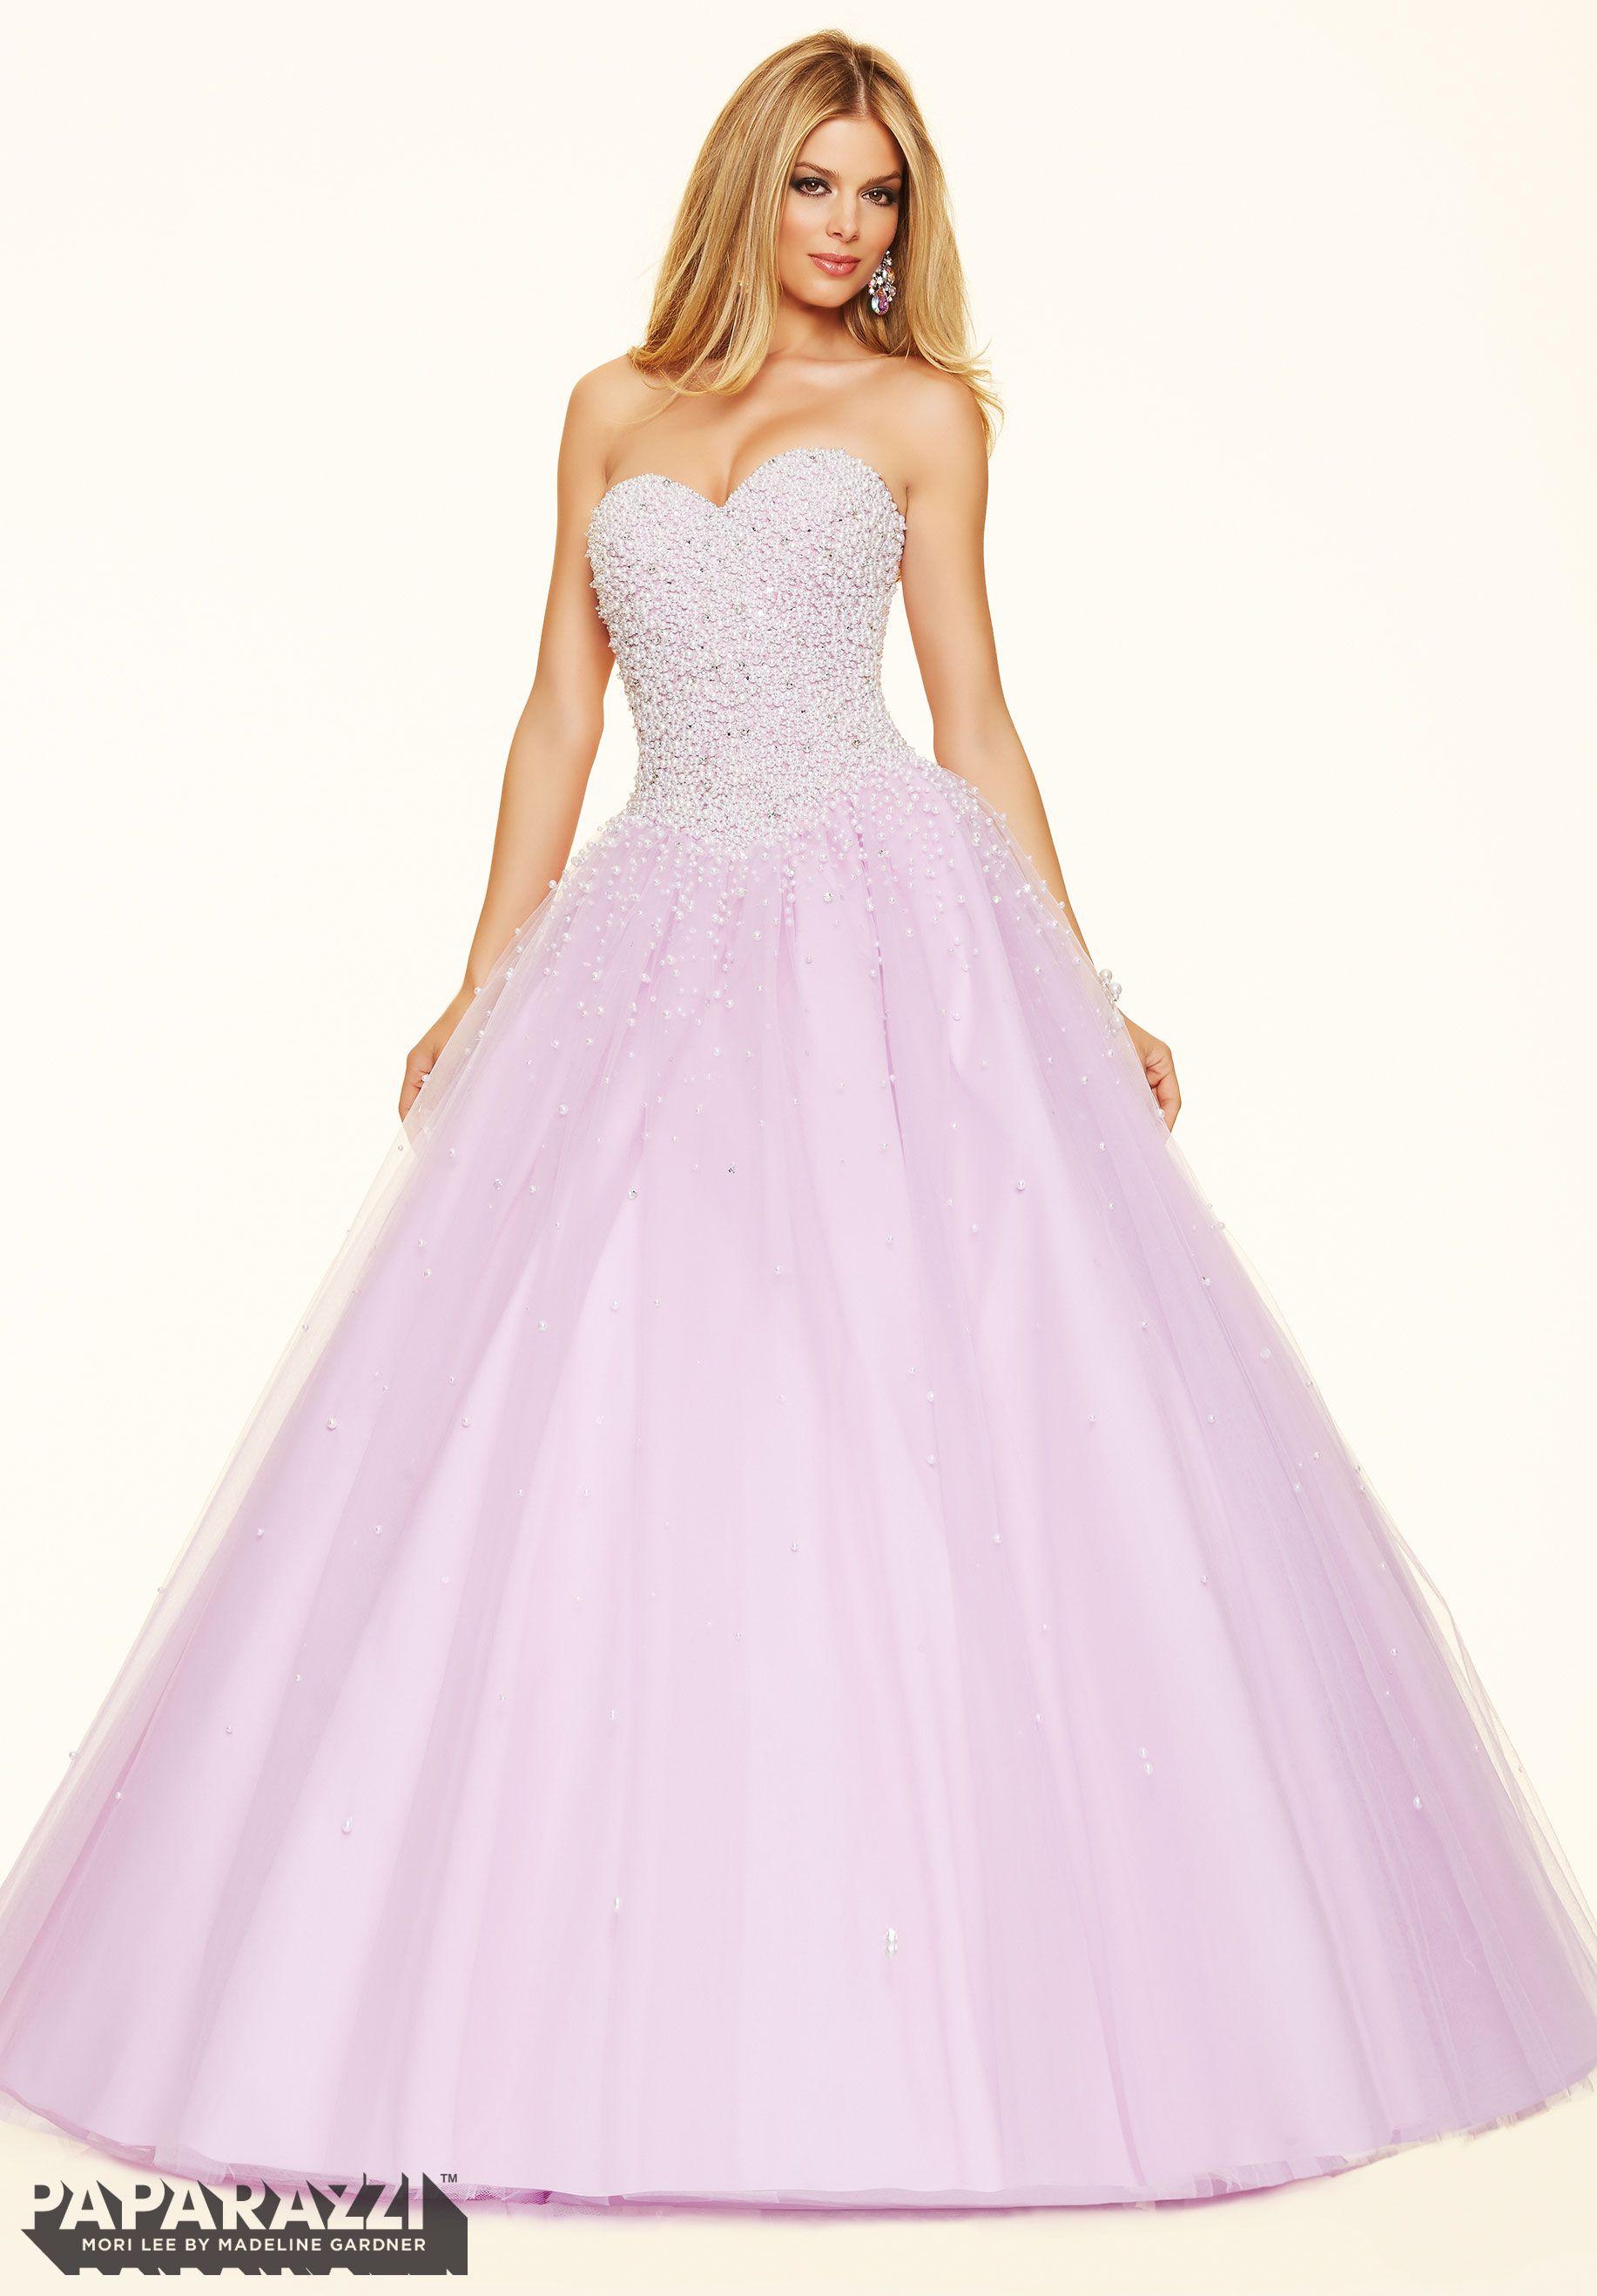 Prom Dresses by Paparazzi Prom - Dress Style 98093 | PROM | Pinterest